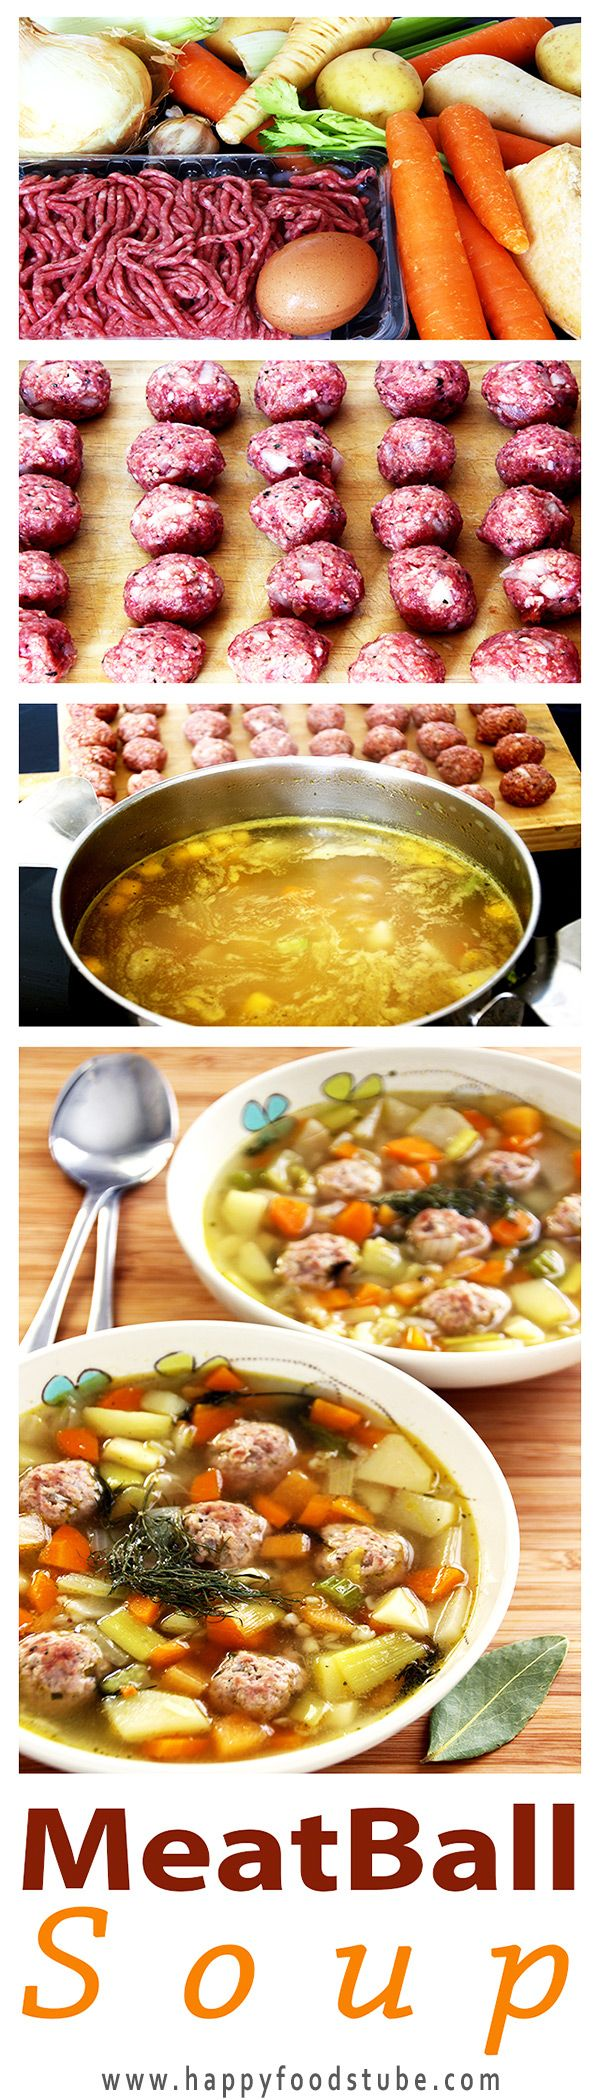 Estonian Meatball Soup (Frikadelli Supp) - Easy soup recipe | happyfoodstube.com